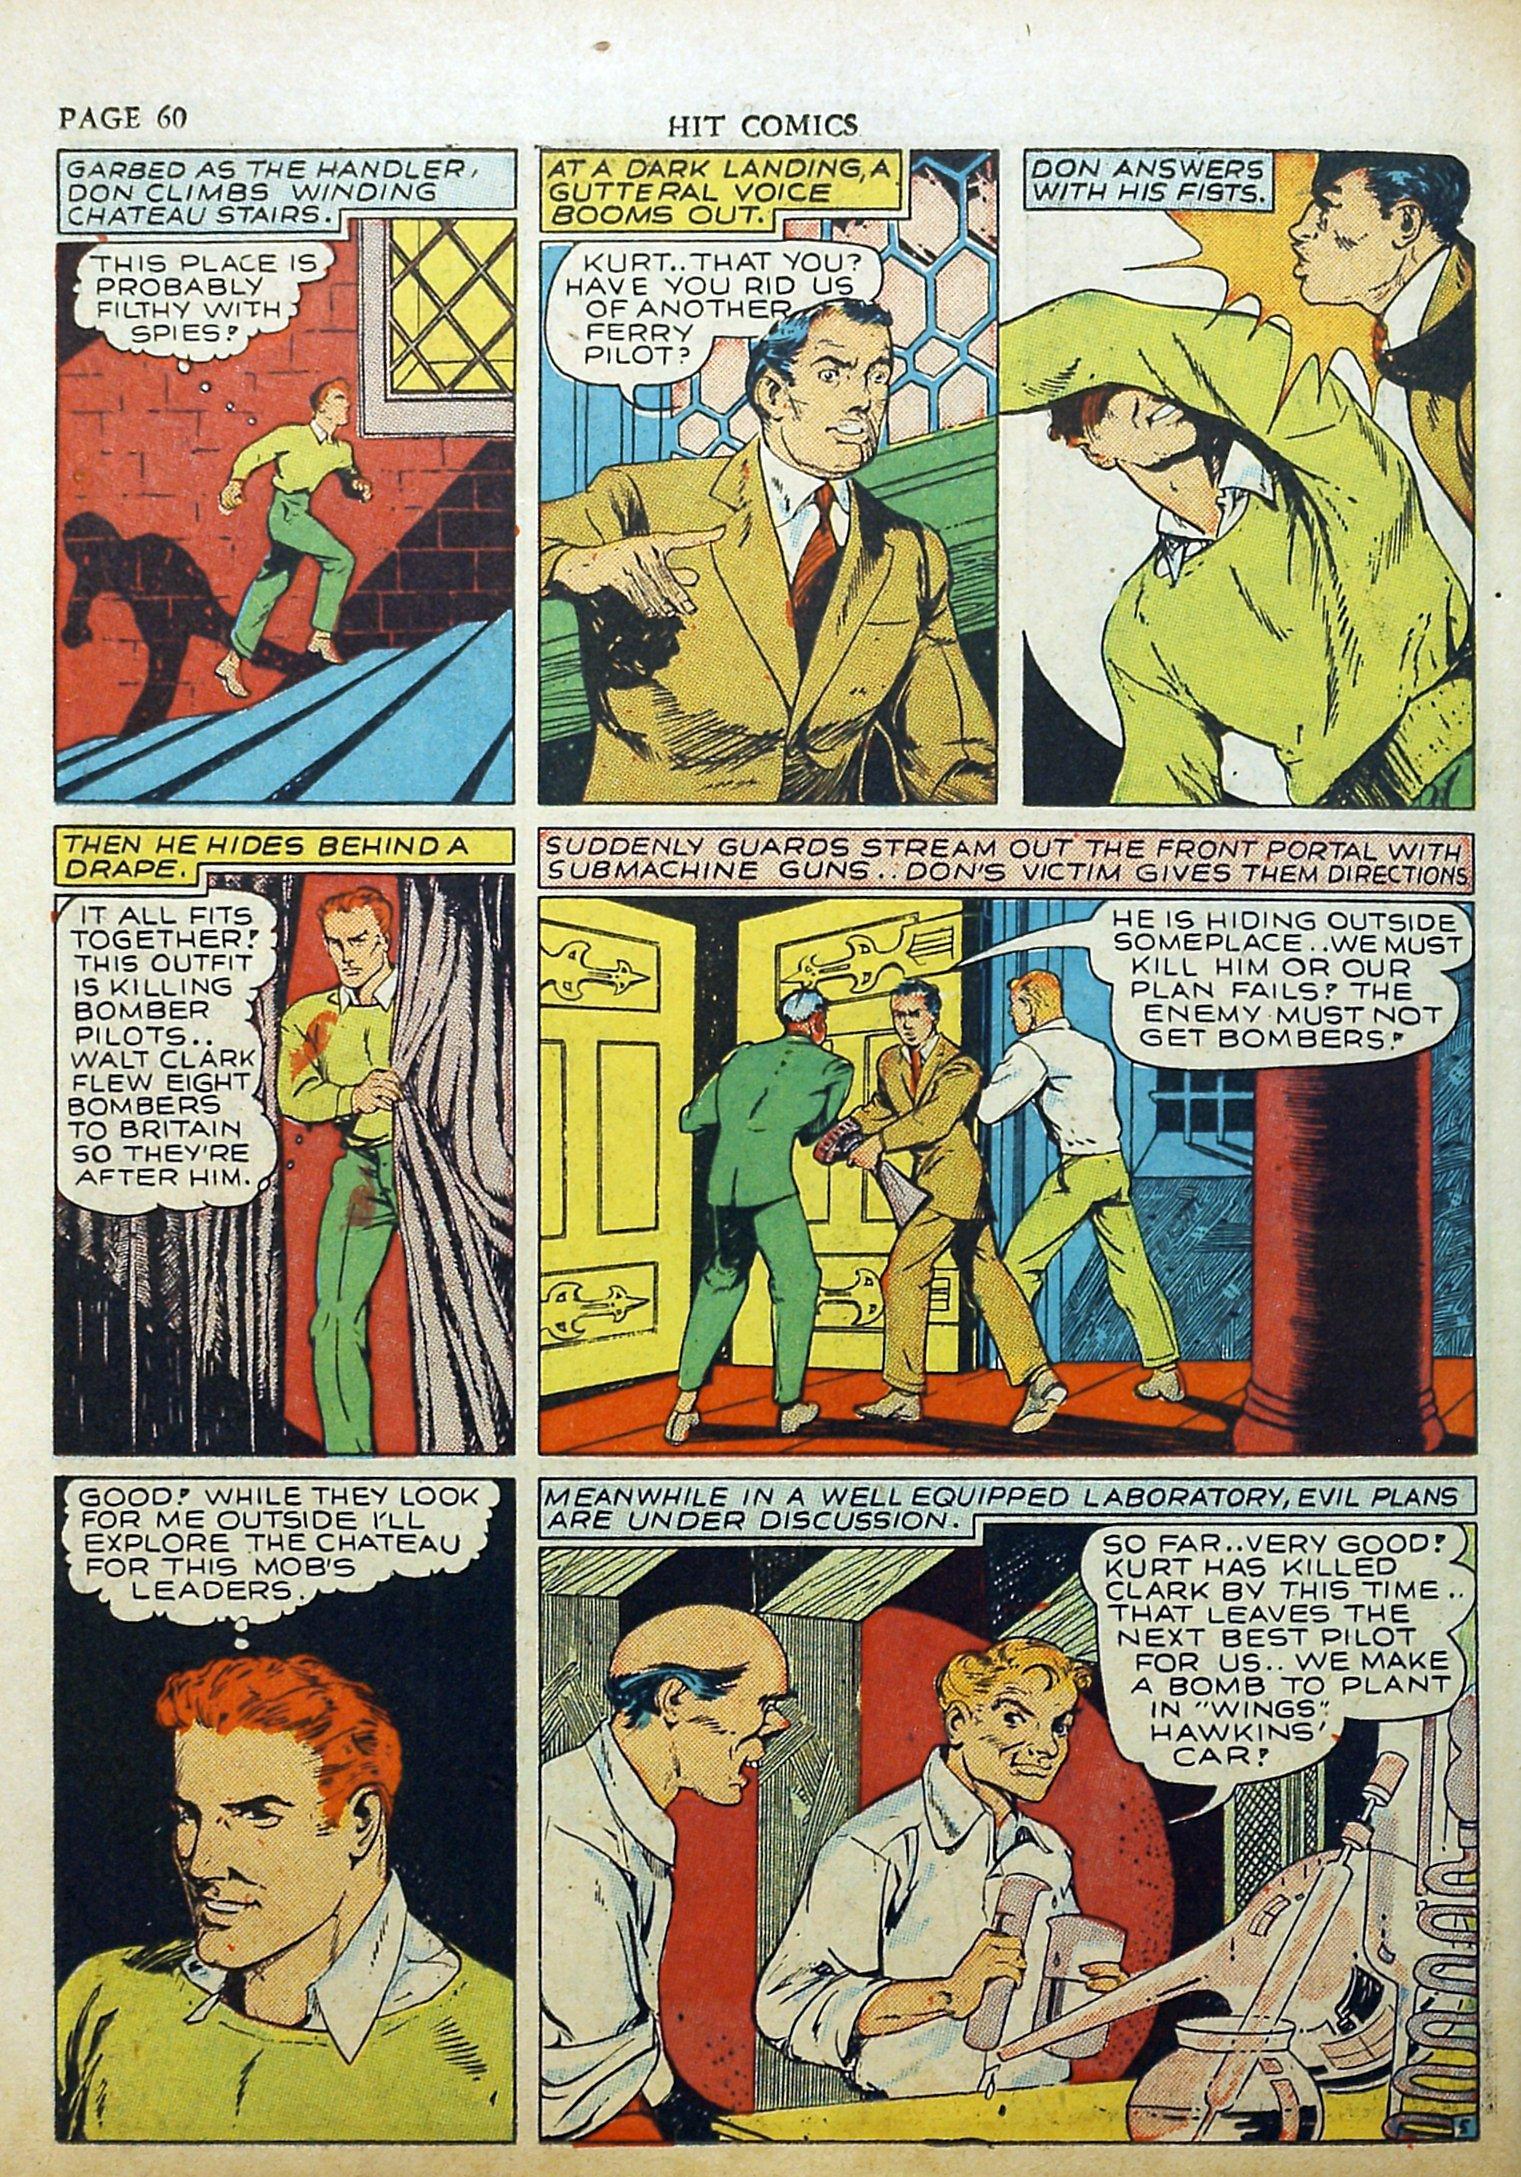 Read online Hit Comics comic -  Issue #17 - 62